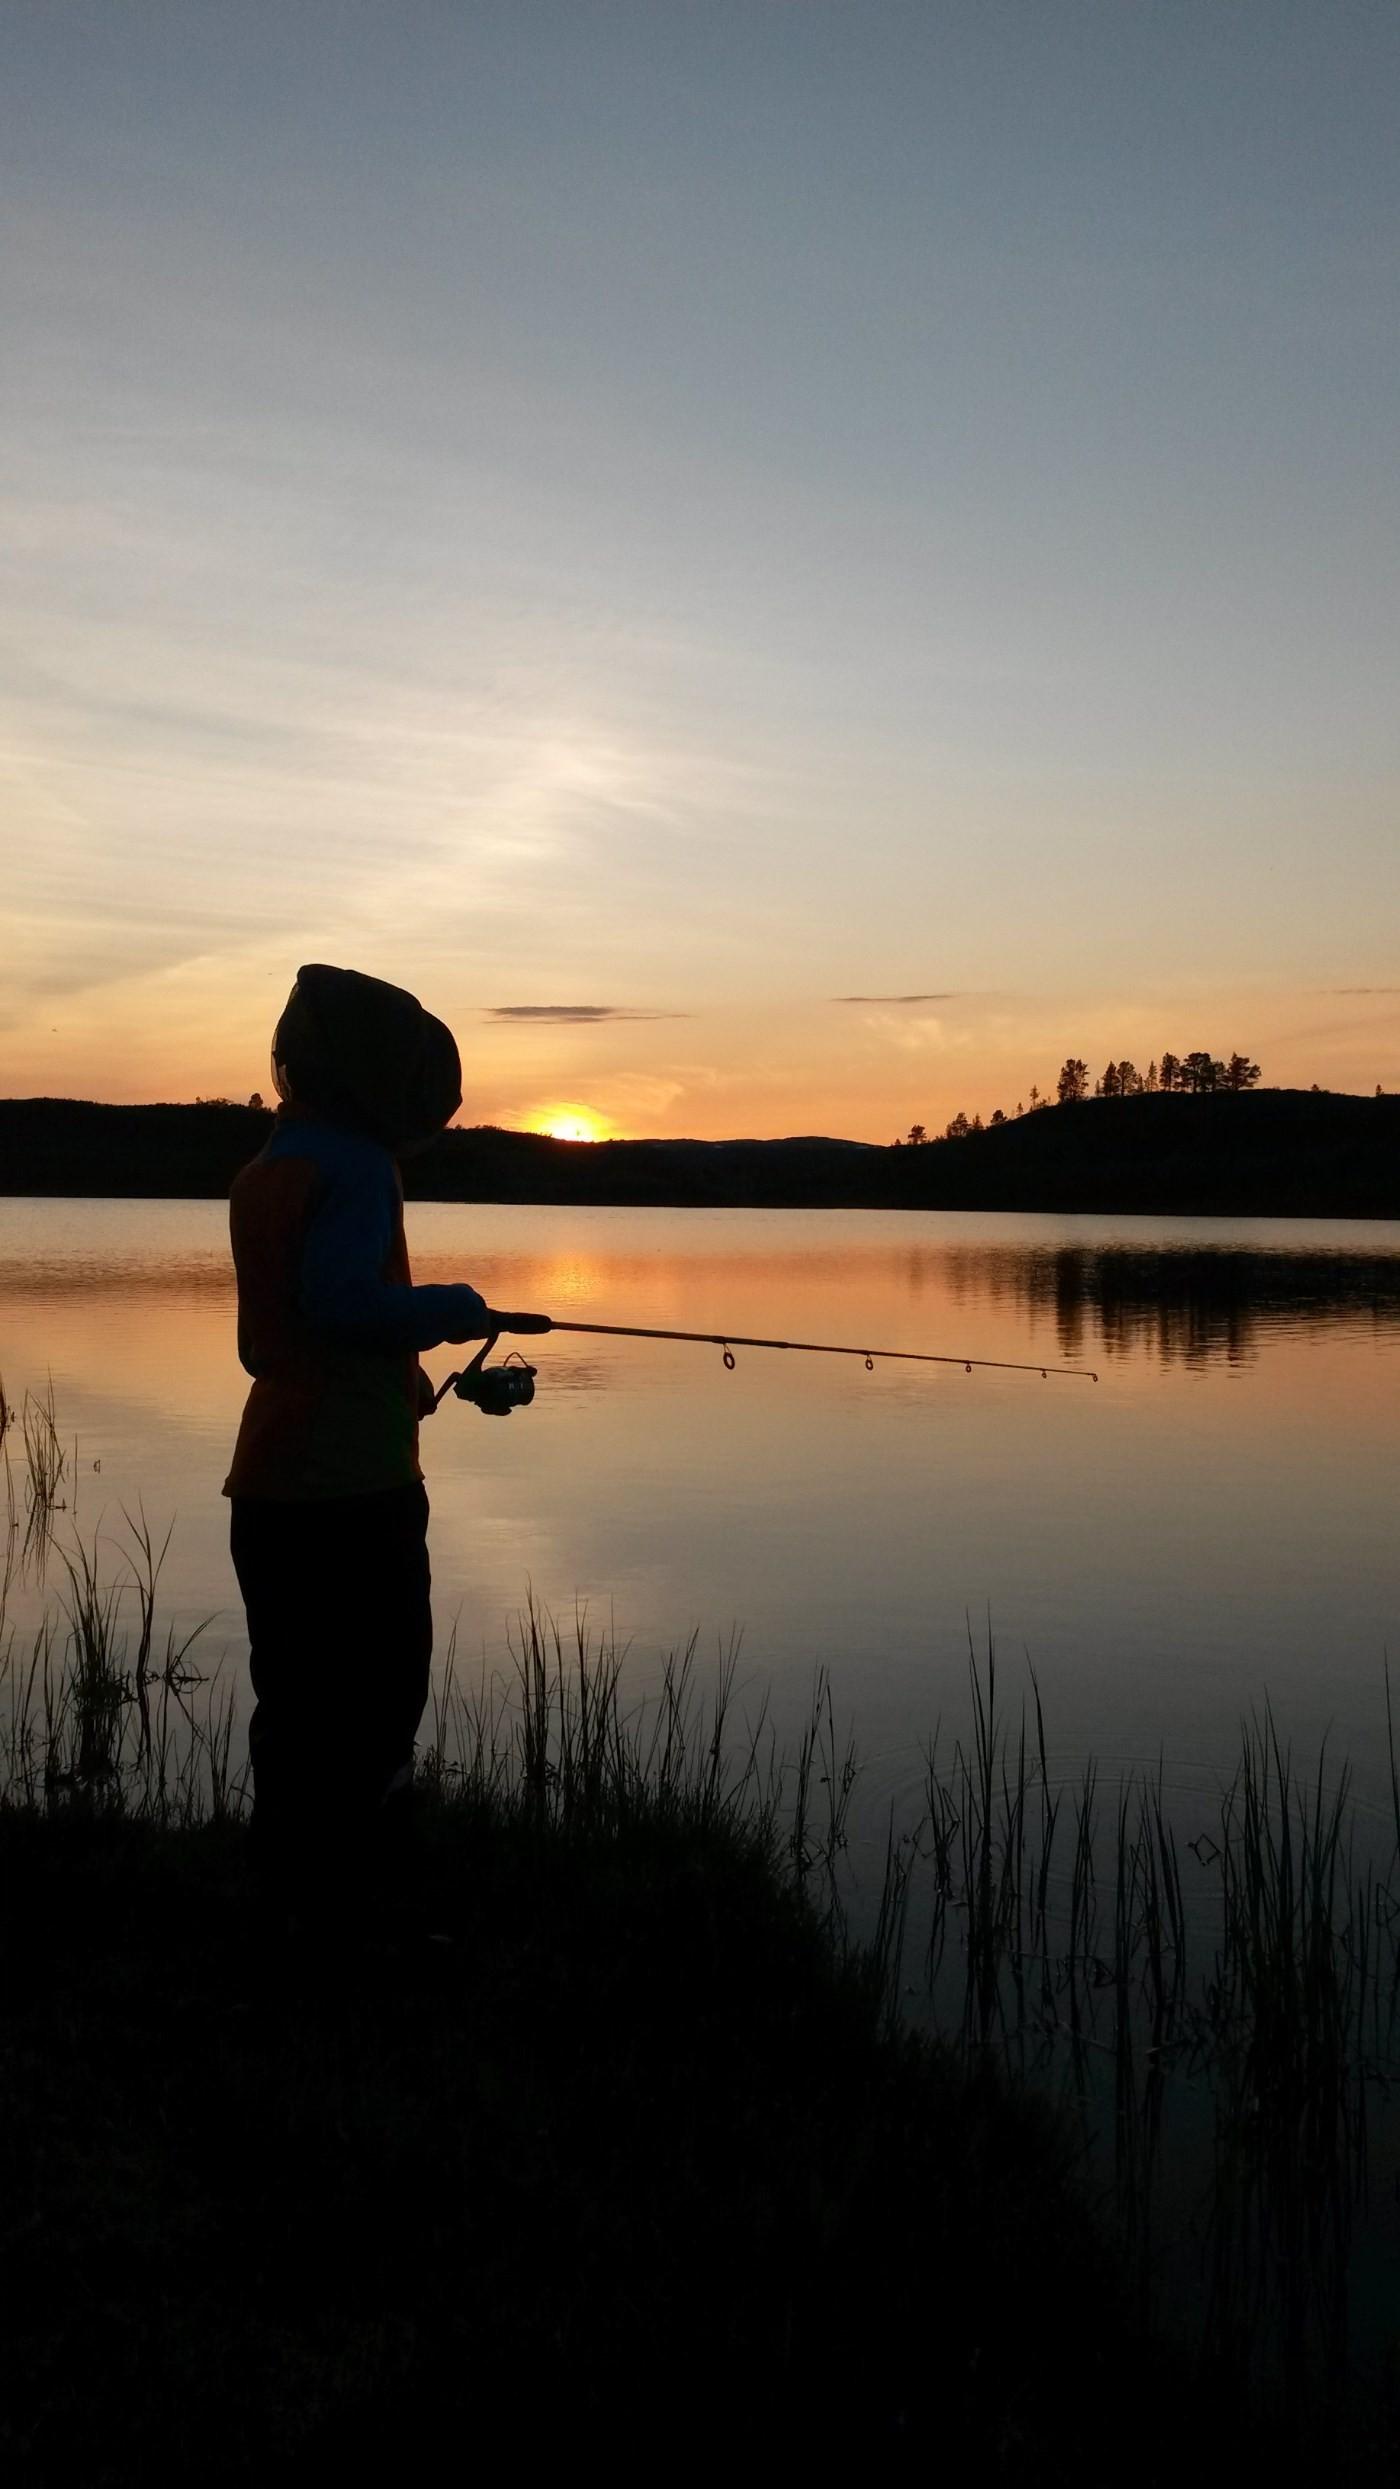 ung fisker